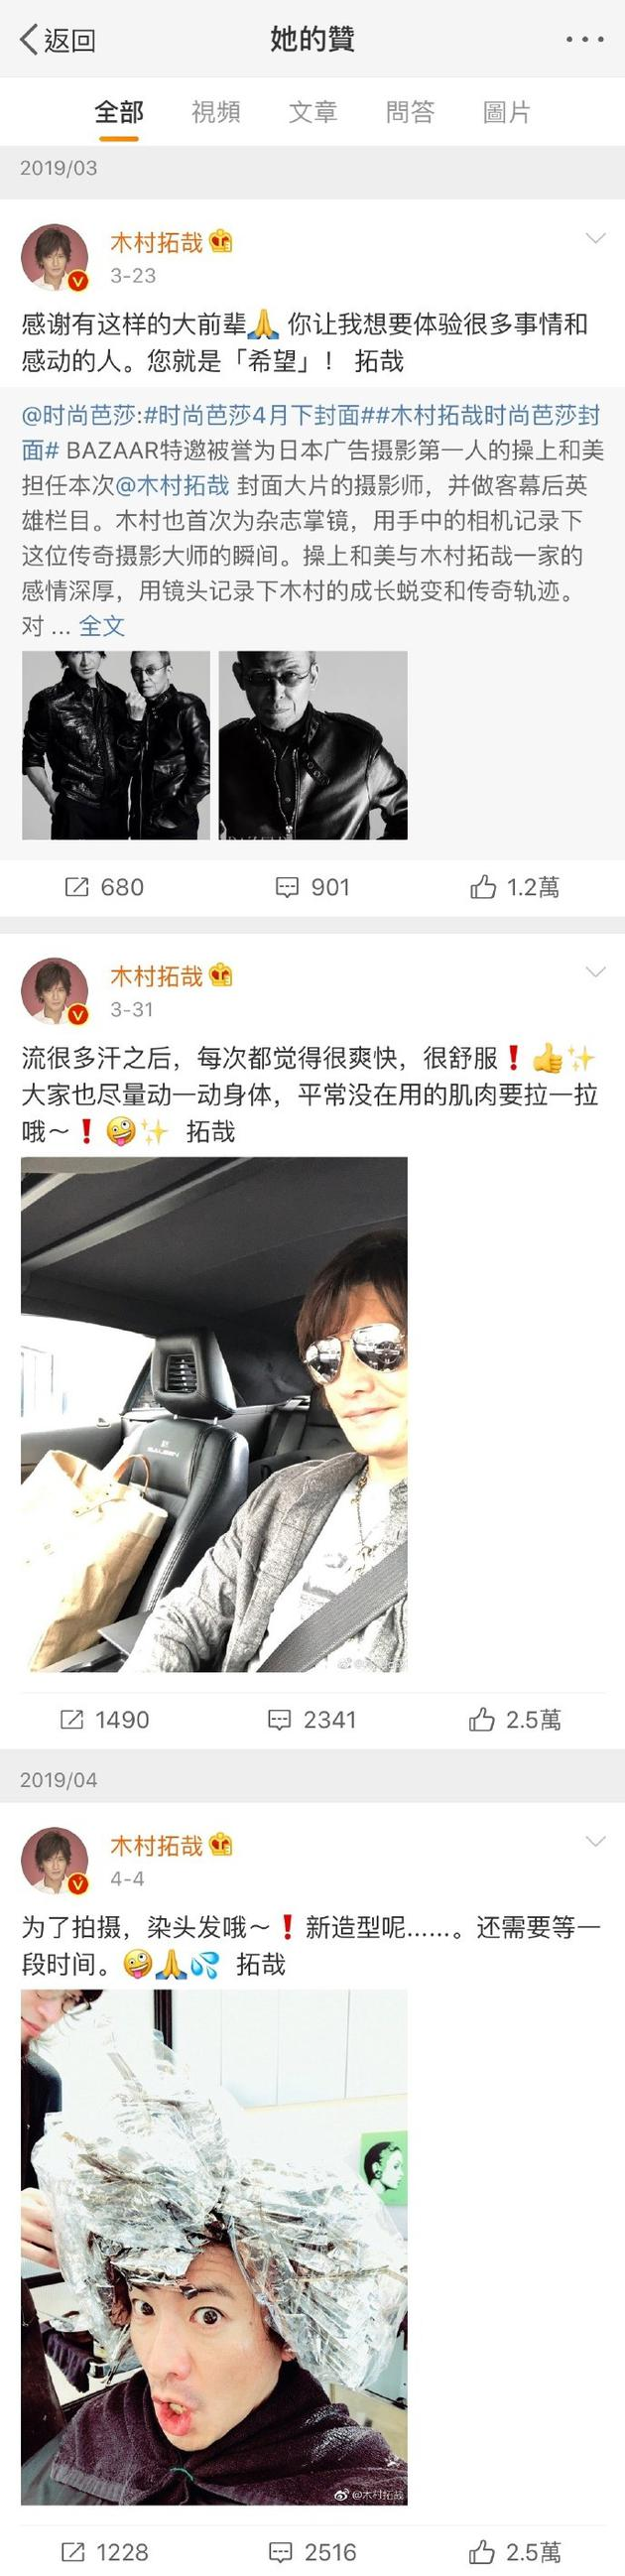 Weibo 木村 拓哉